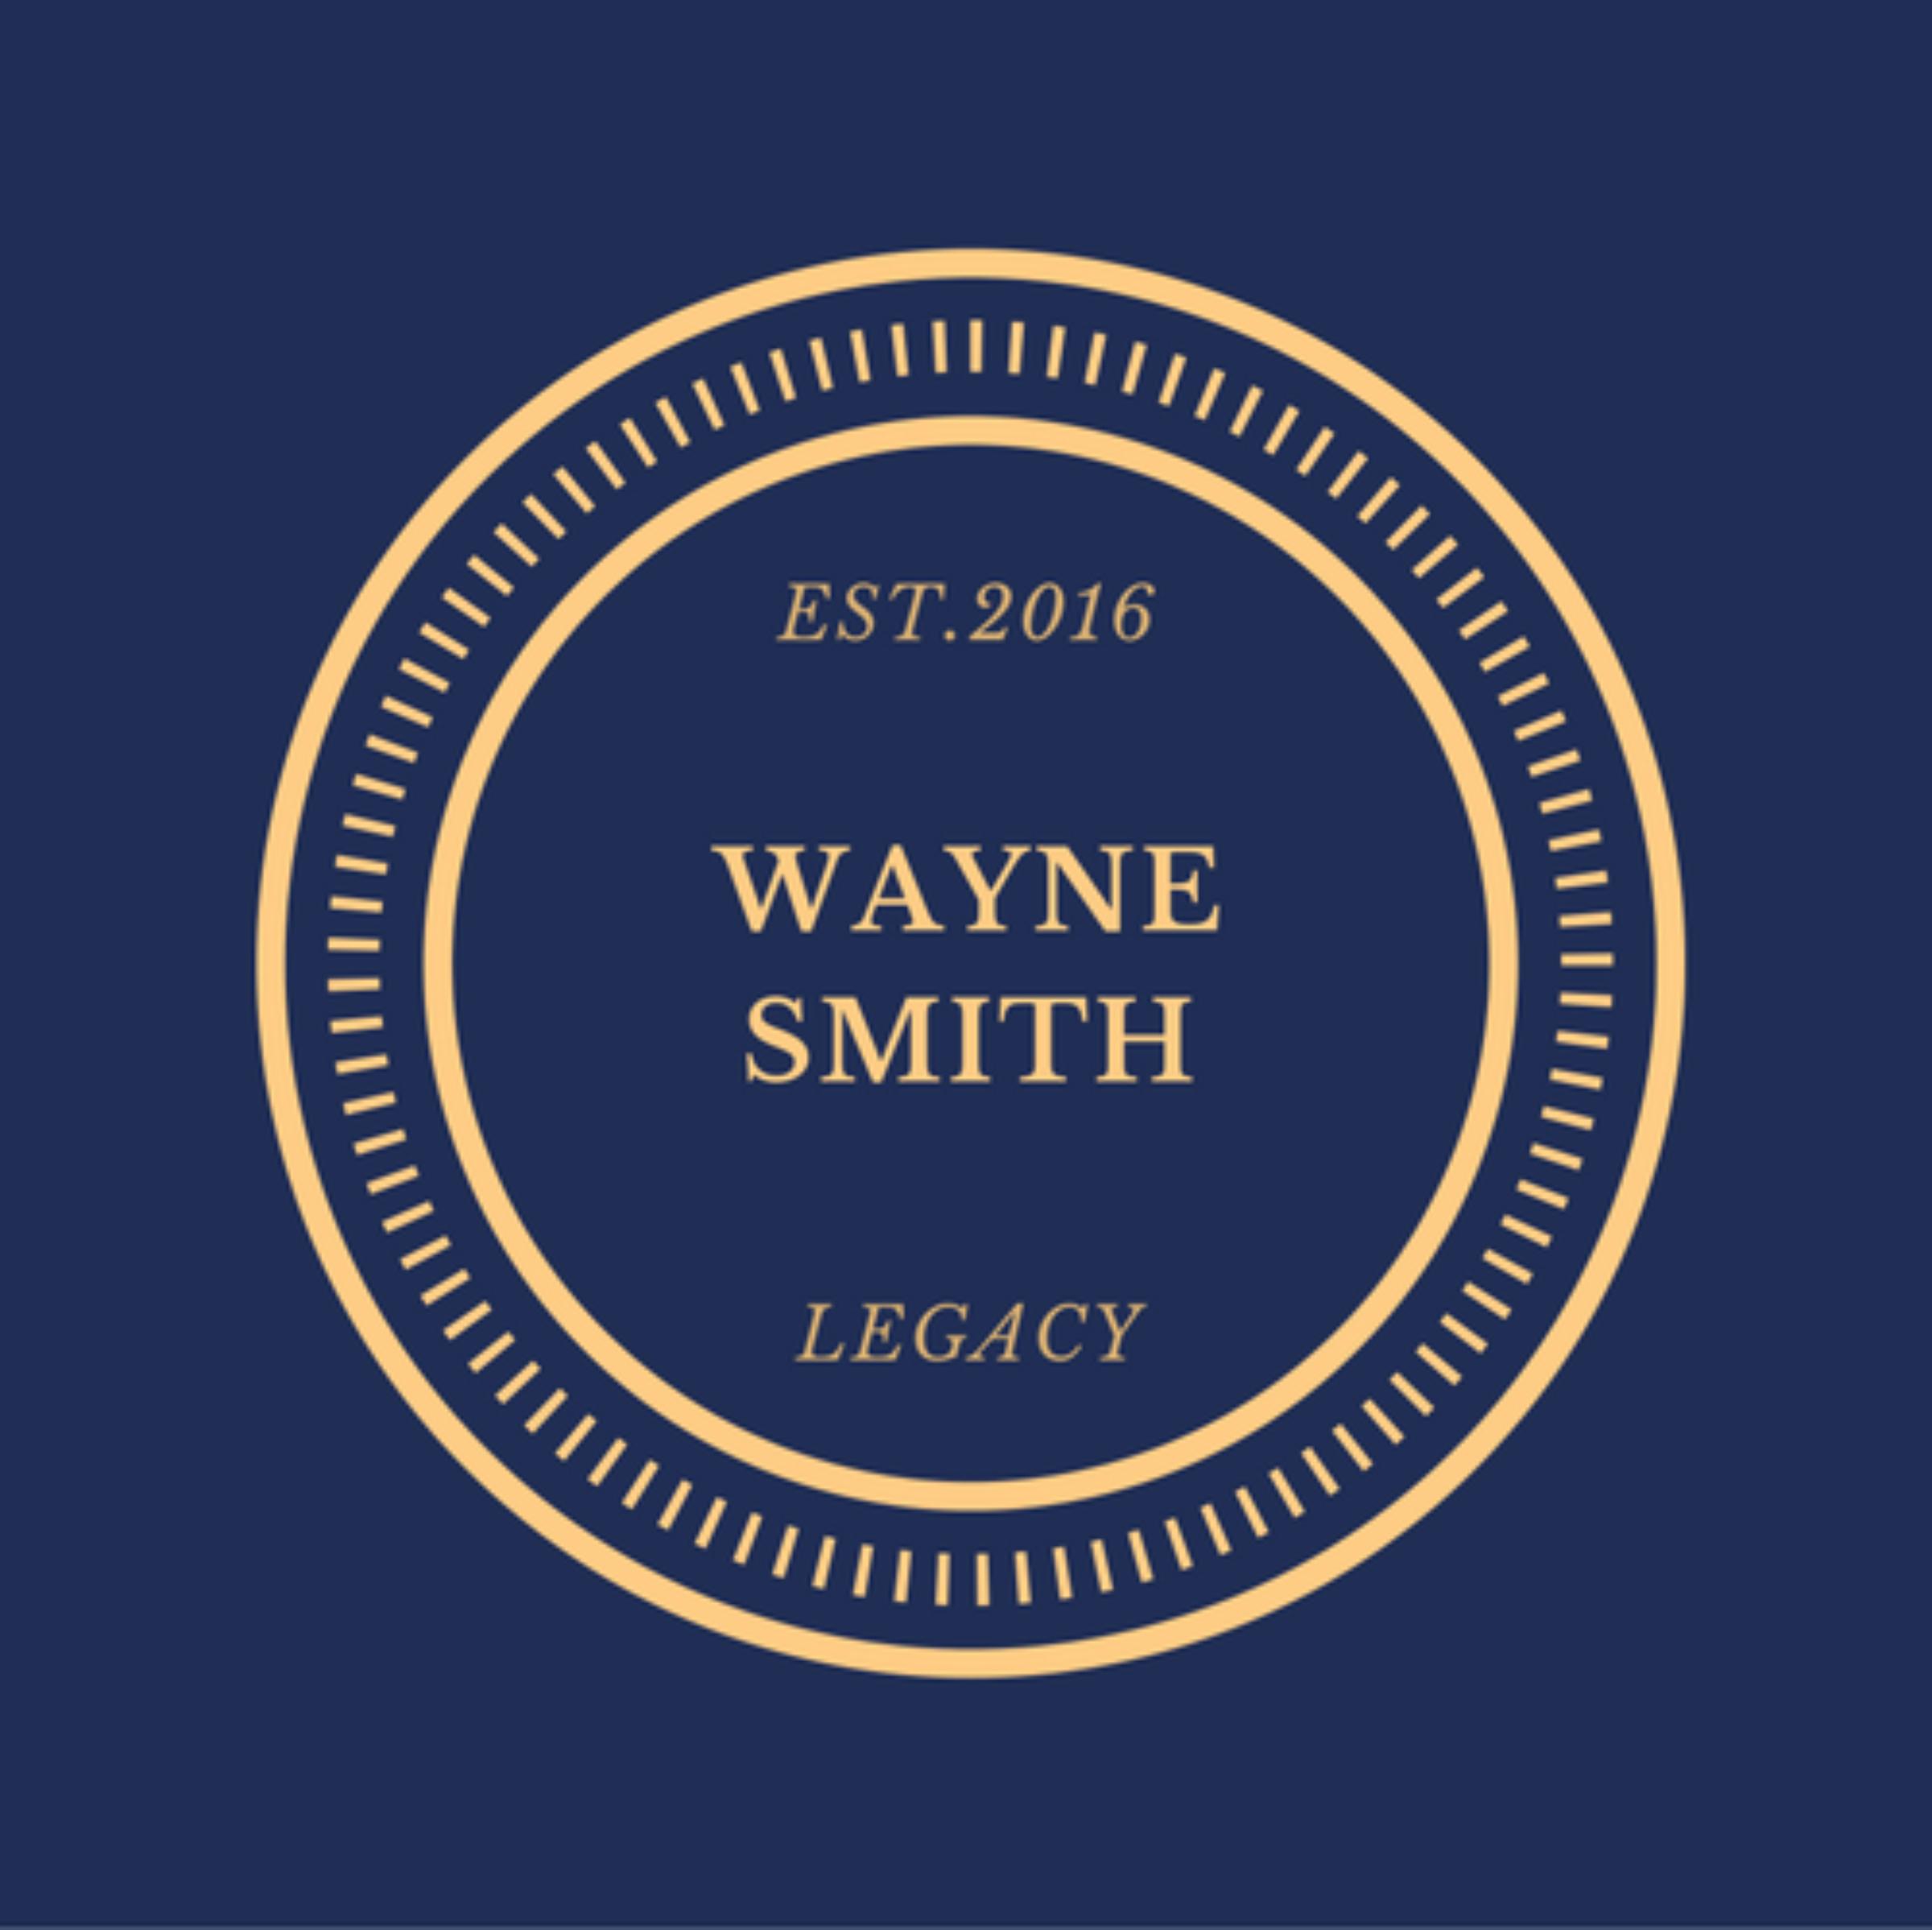 Wayne Smith